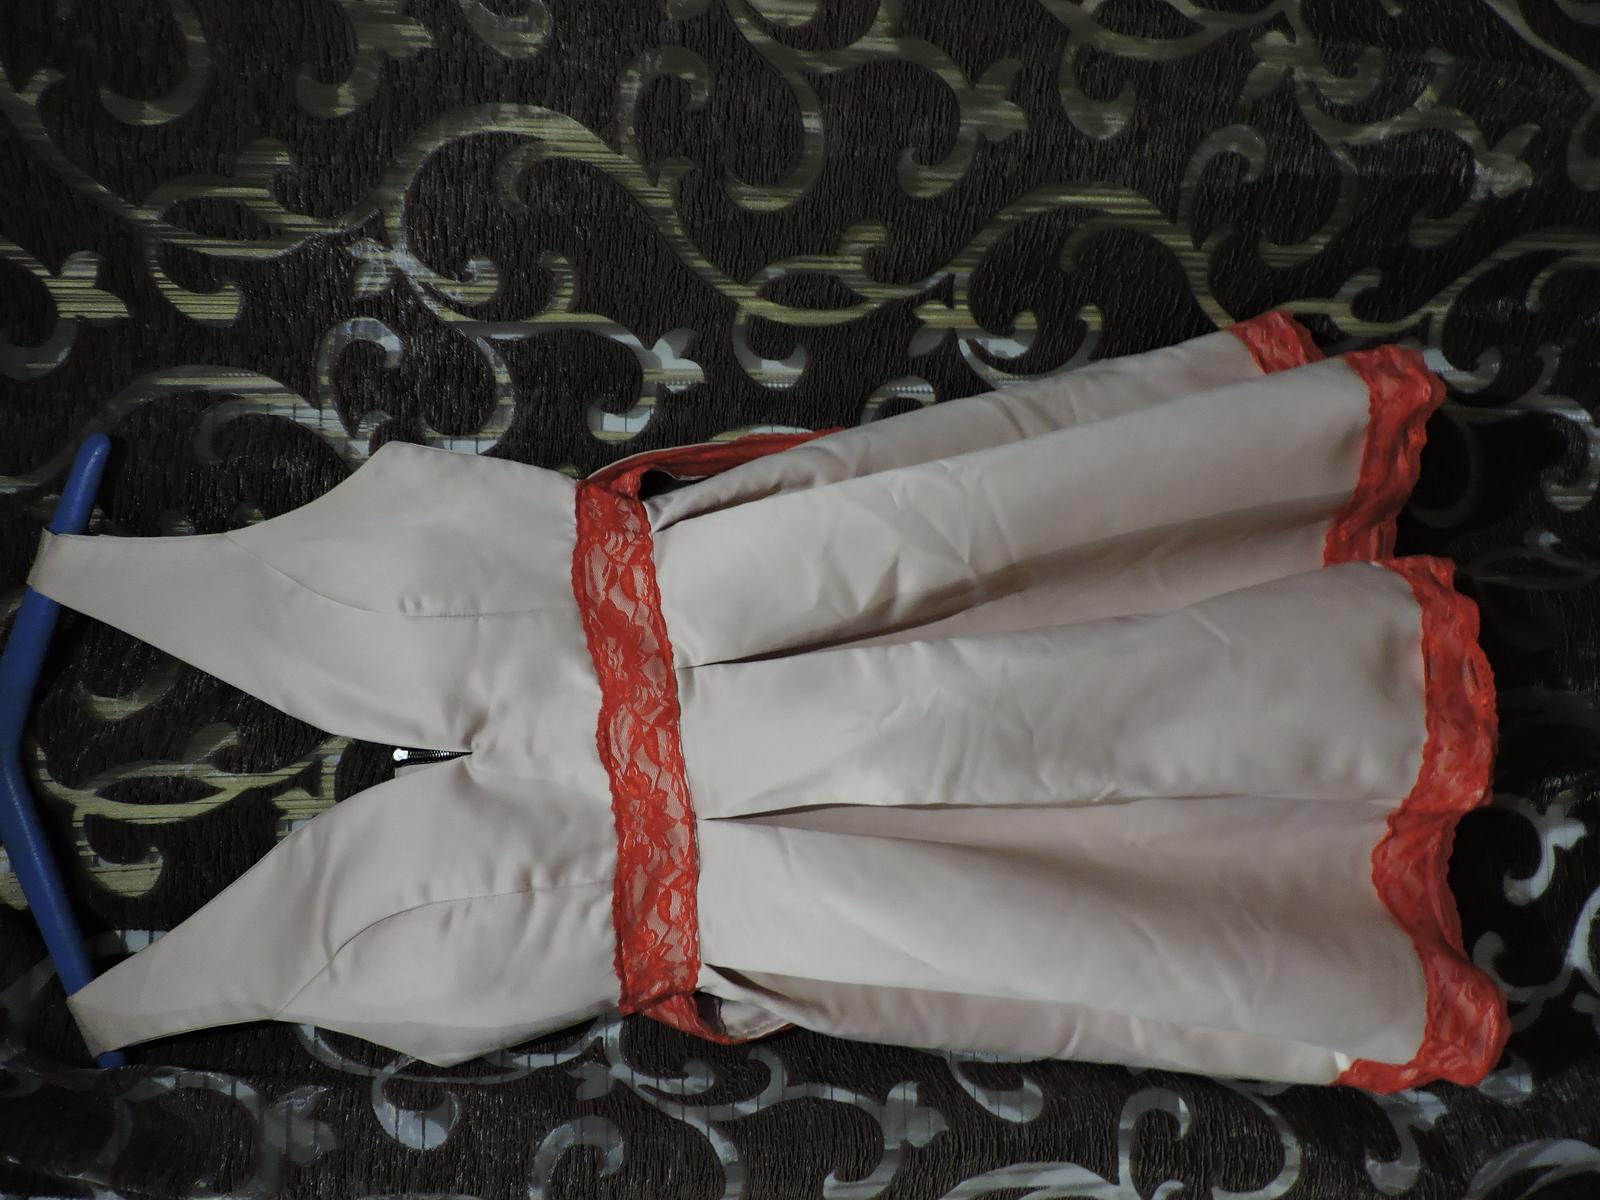 kratke šaty - Obrázok č. 1